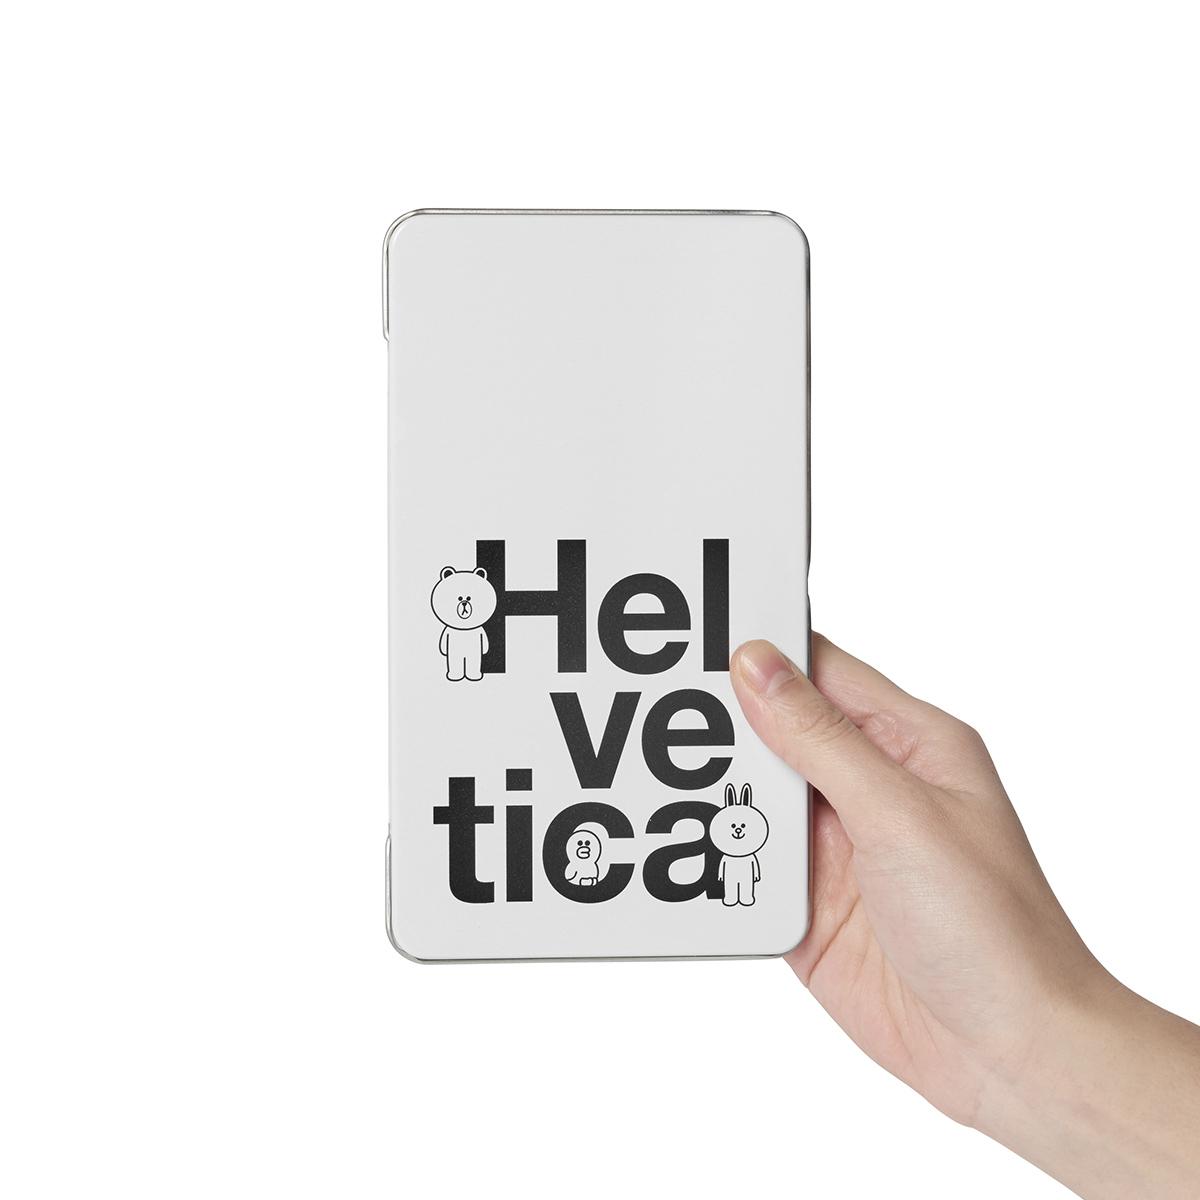 HELVETICA 브라운앤프렌즈 다크초콜릿